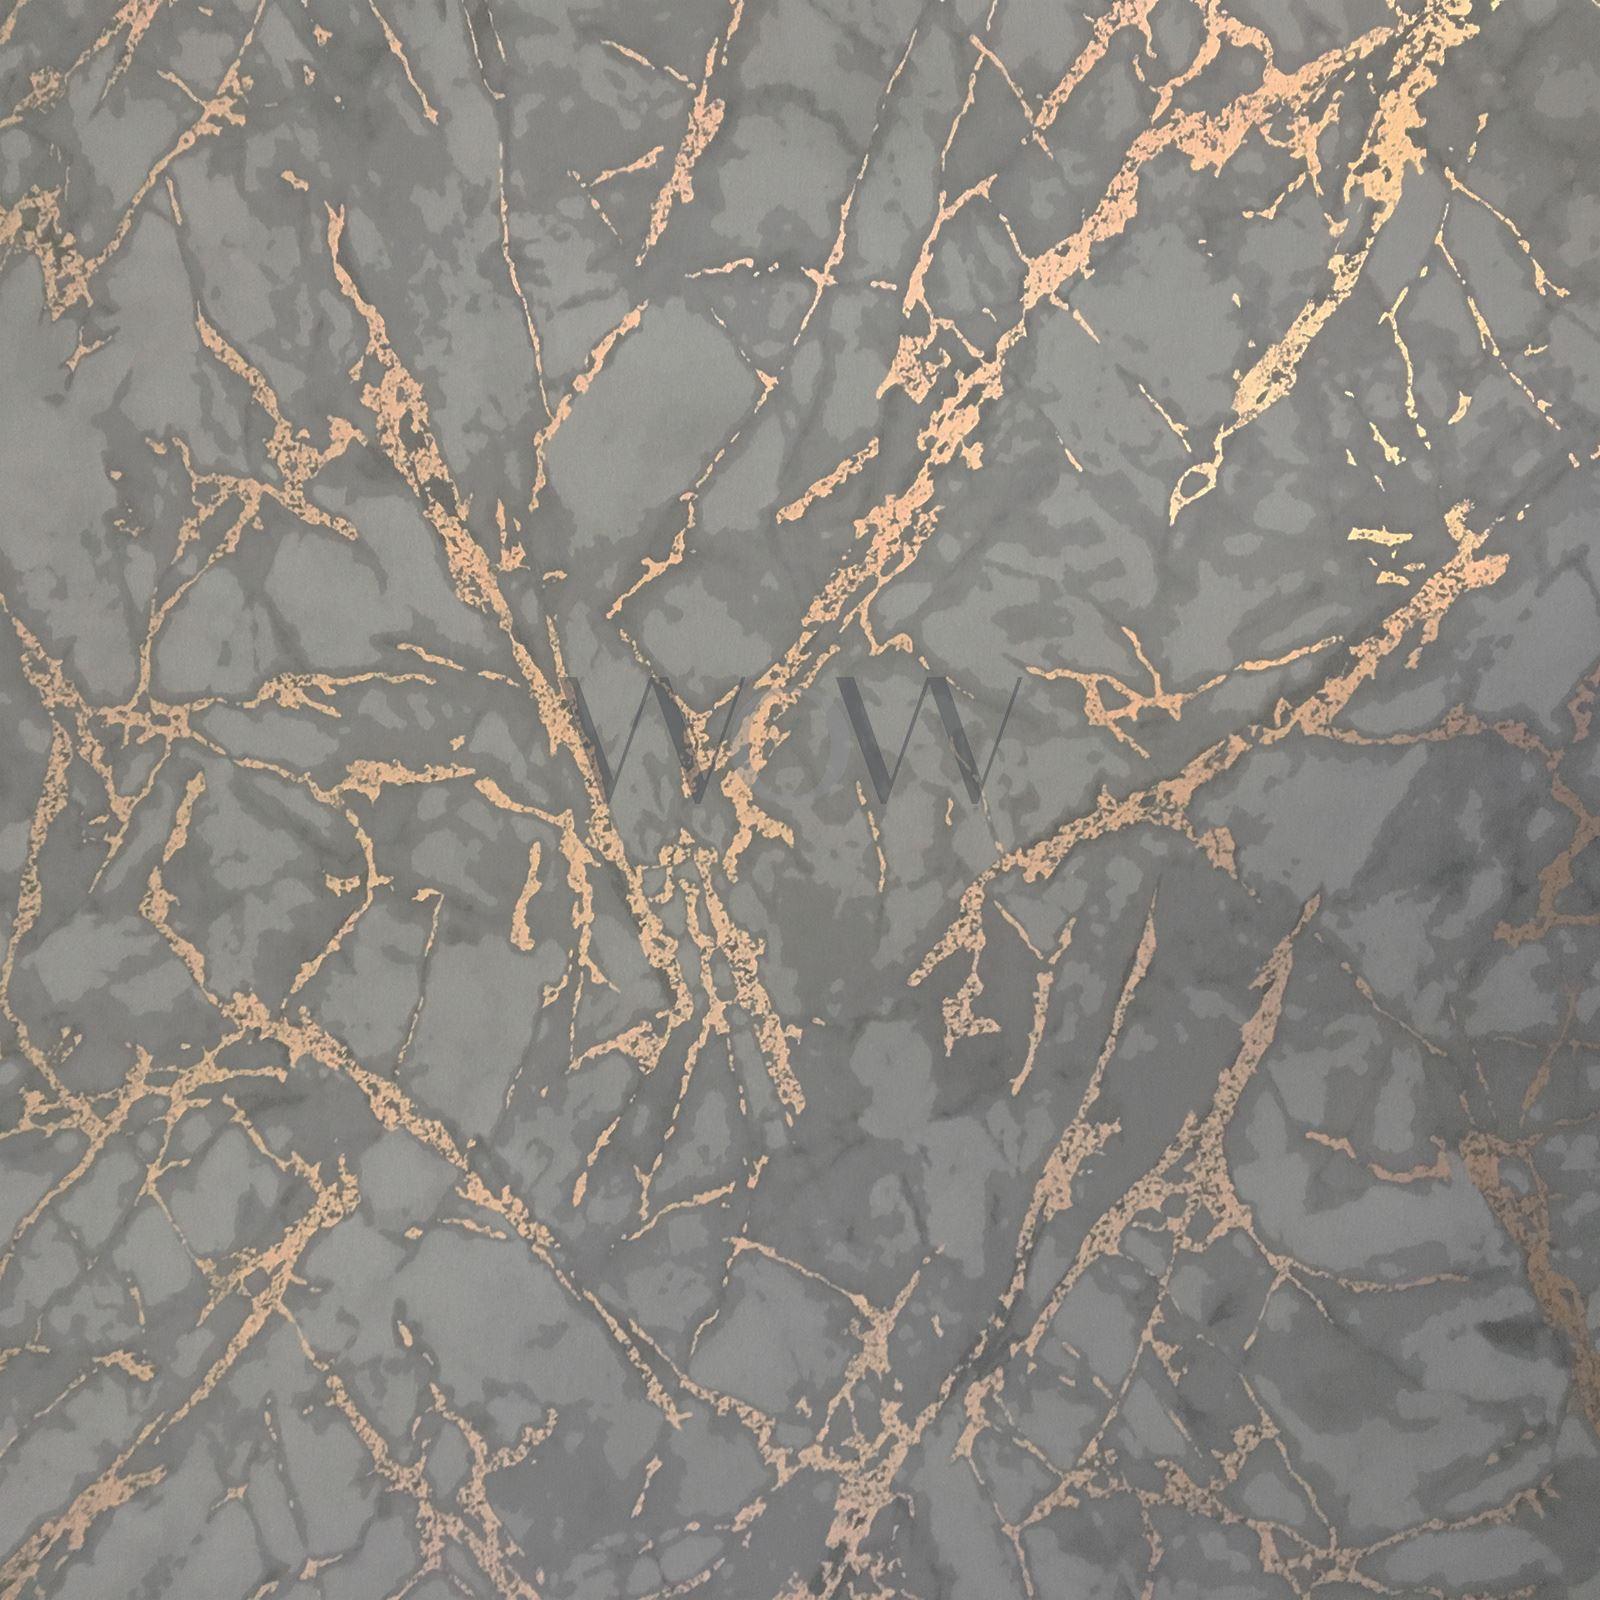 fine decor metallic geometric plain marble wallpaper. Black Bedroom Furniture Sets. Home Design Ideas